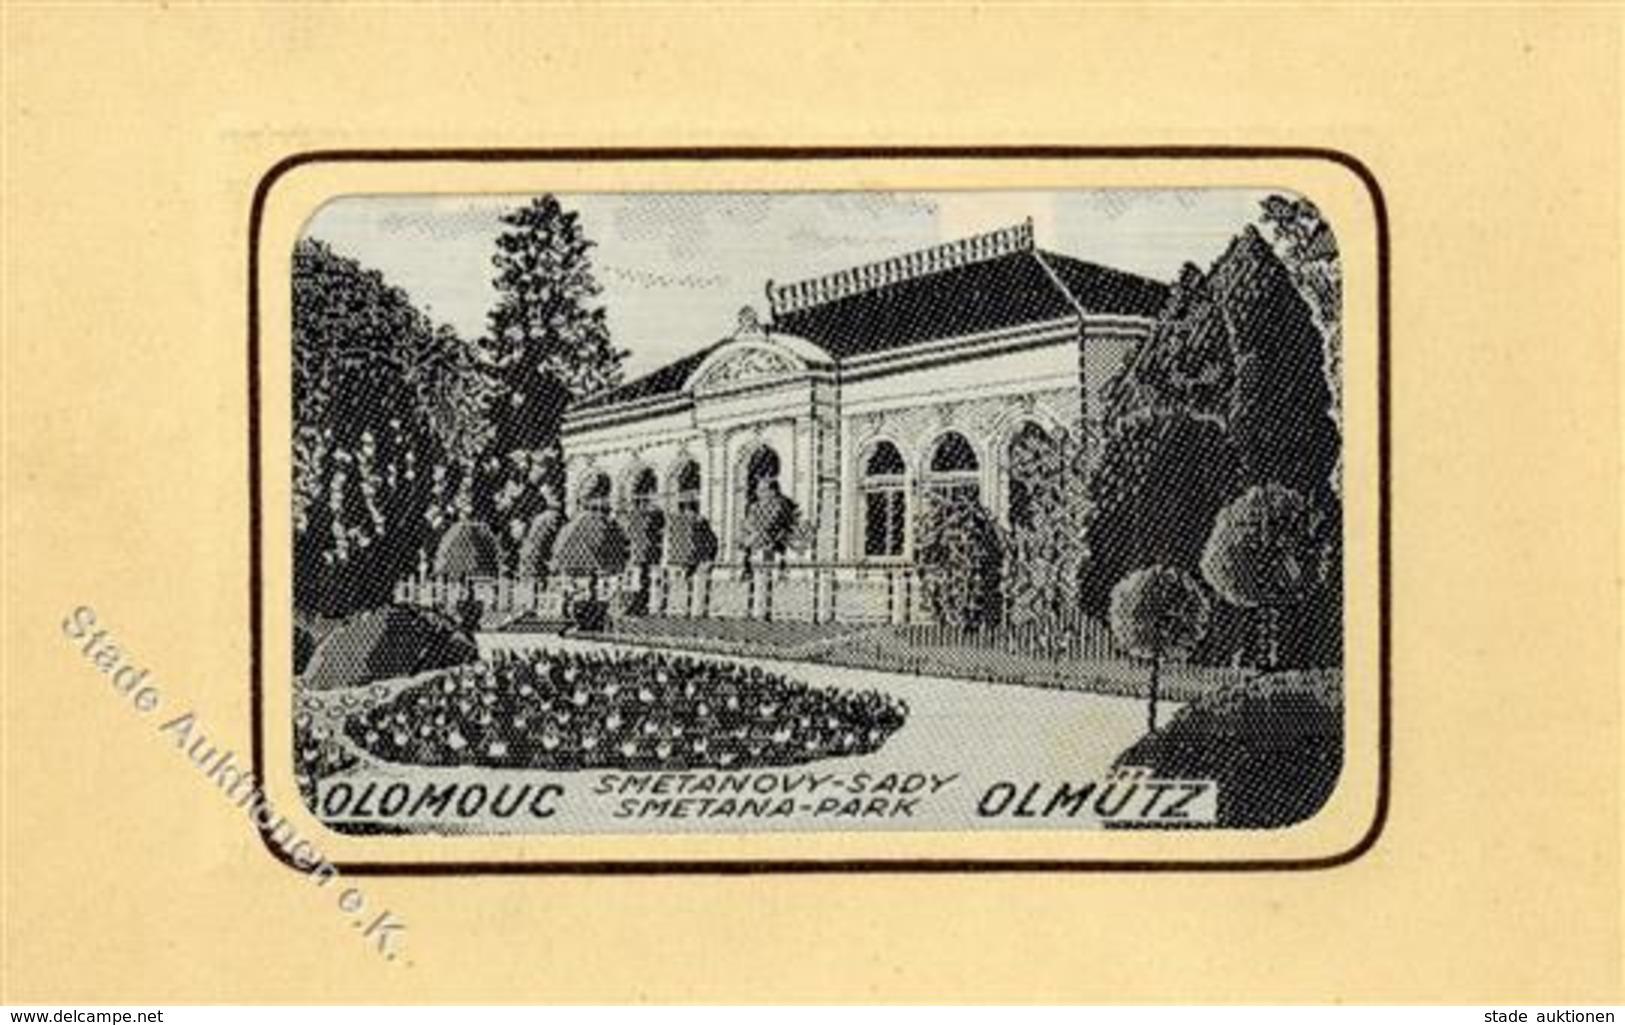 Seide Gewebt Ölmütz Smetana Park  I-II Soie - Ansichtskarten